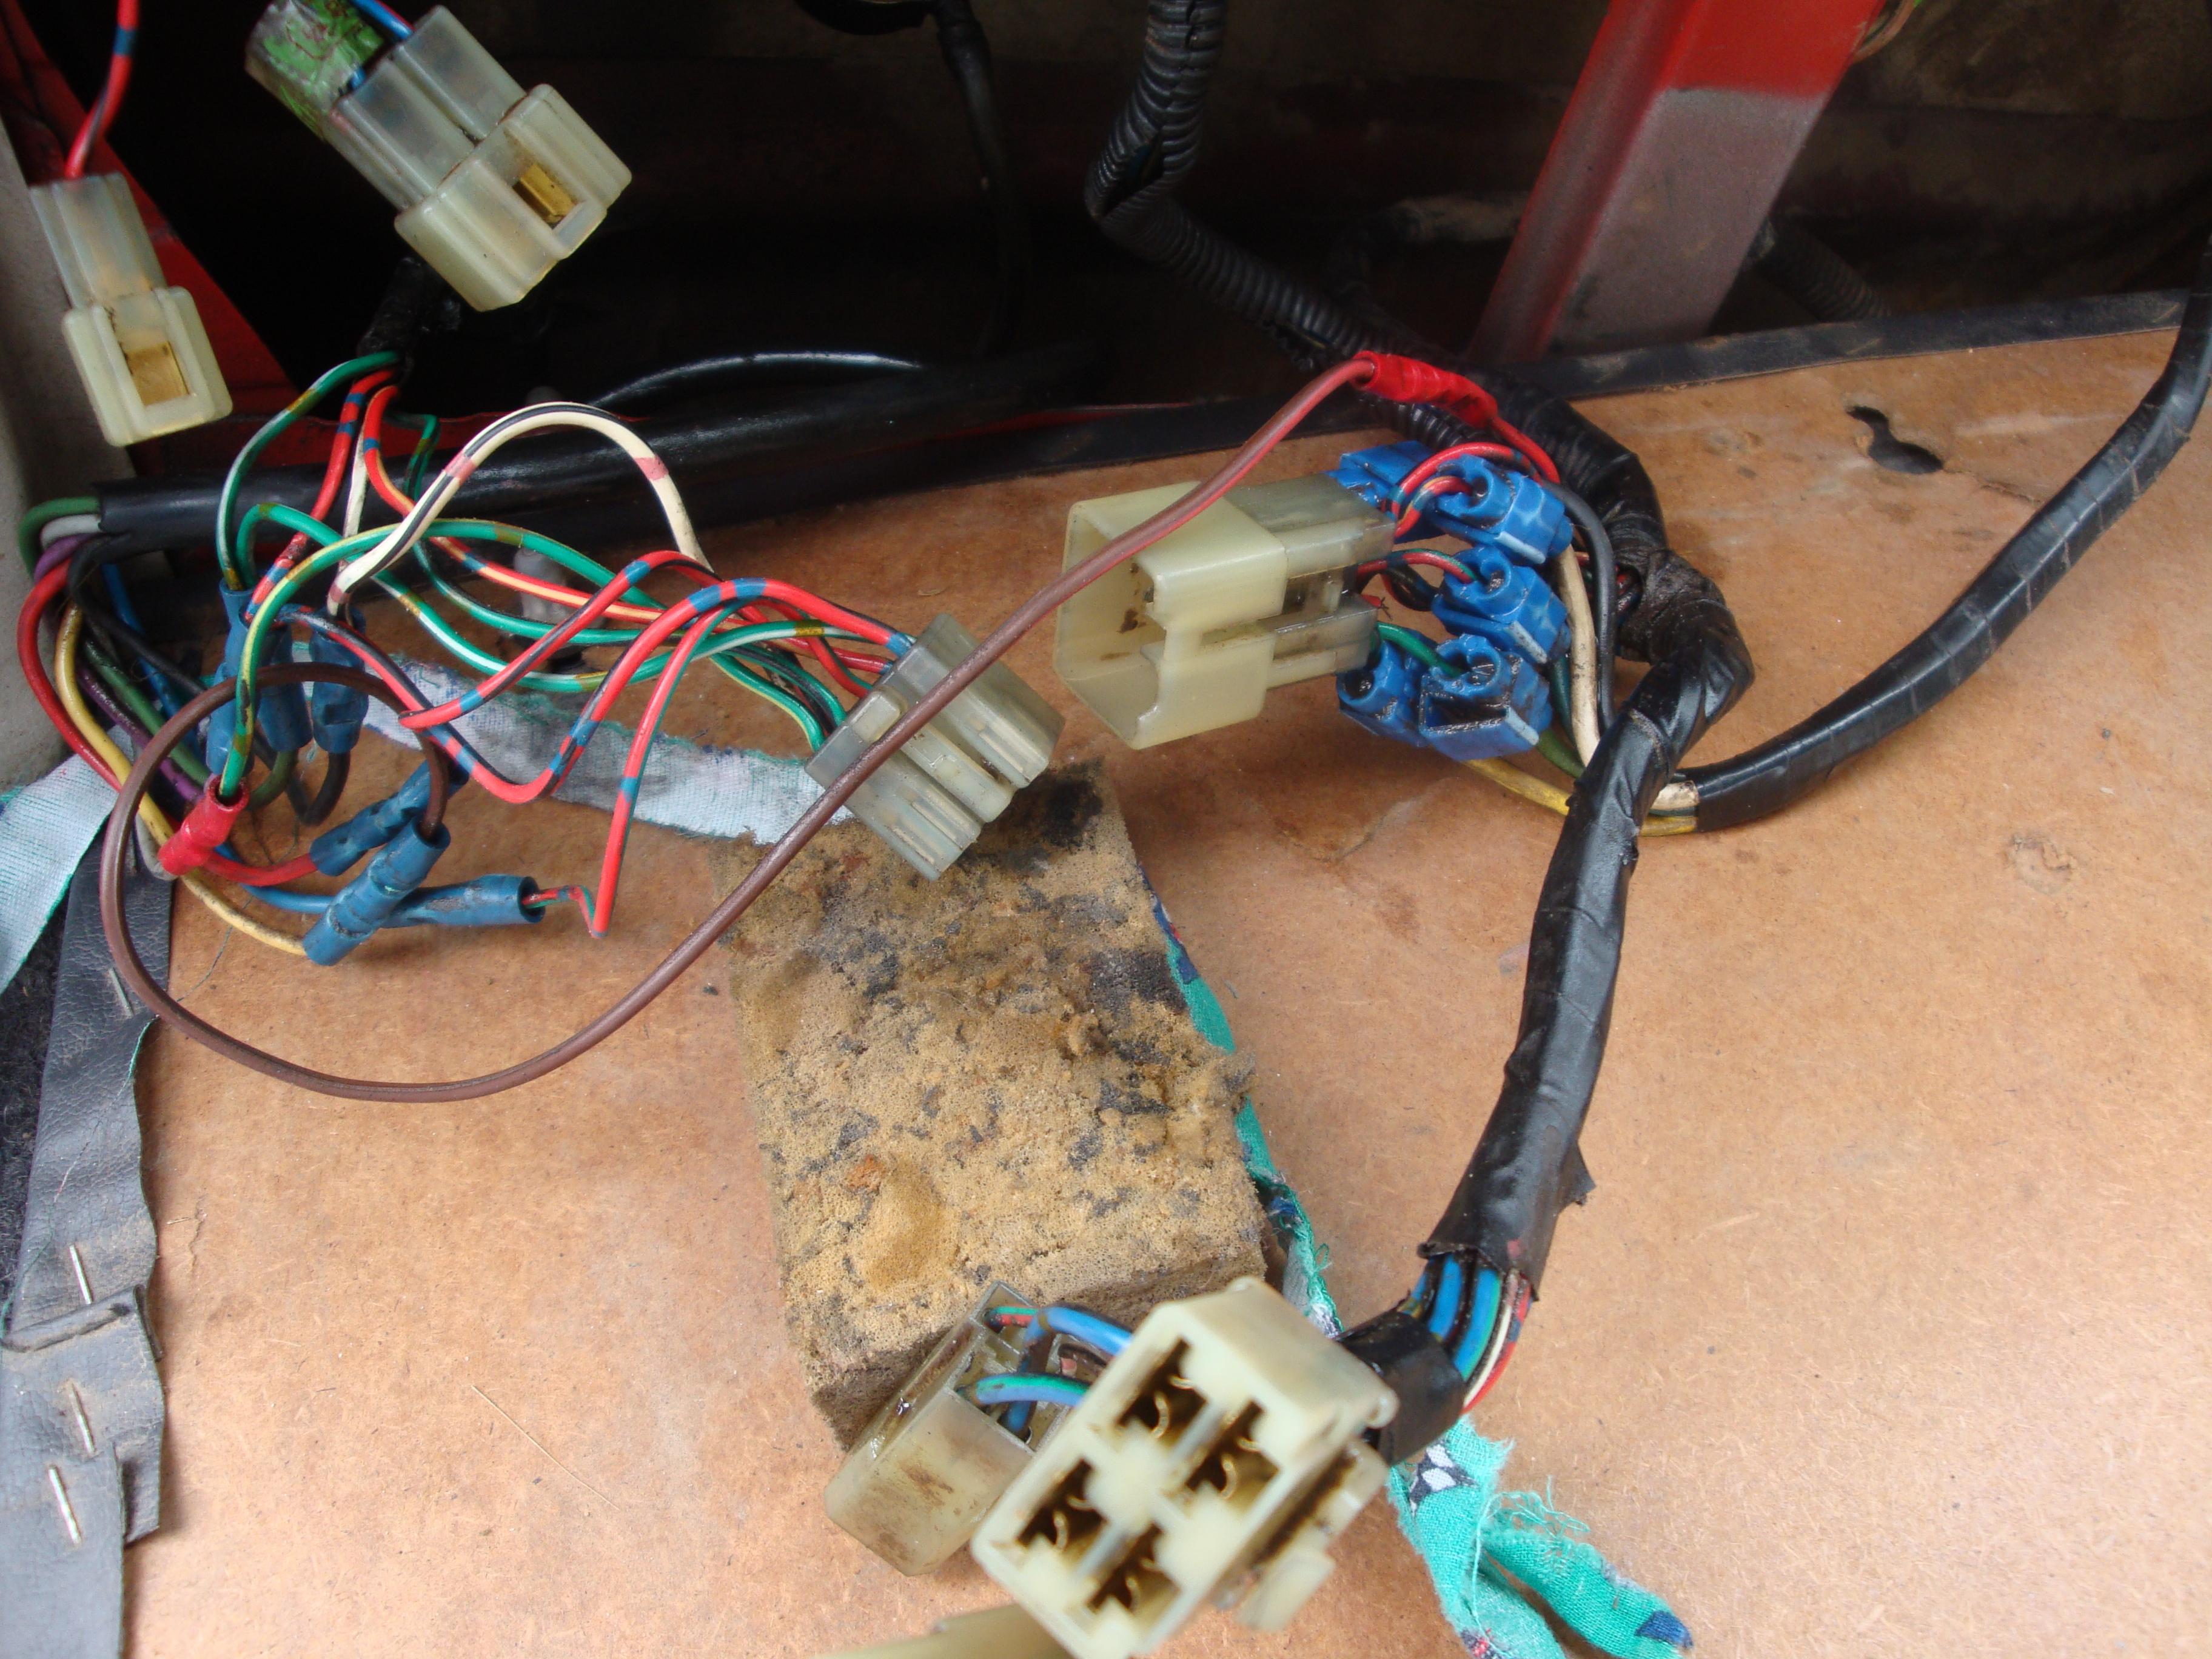 24v Glowalternatordomebuzzerbattery Electrics Hj60 Bj74 Wiring Diagram Landcruiser Rear Leftside